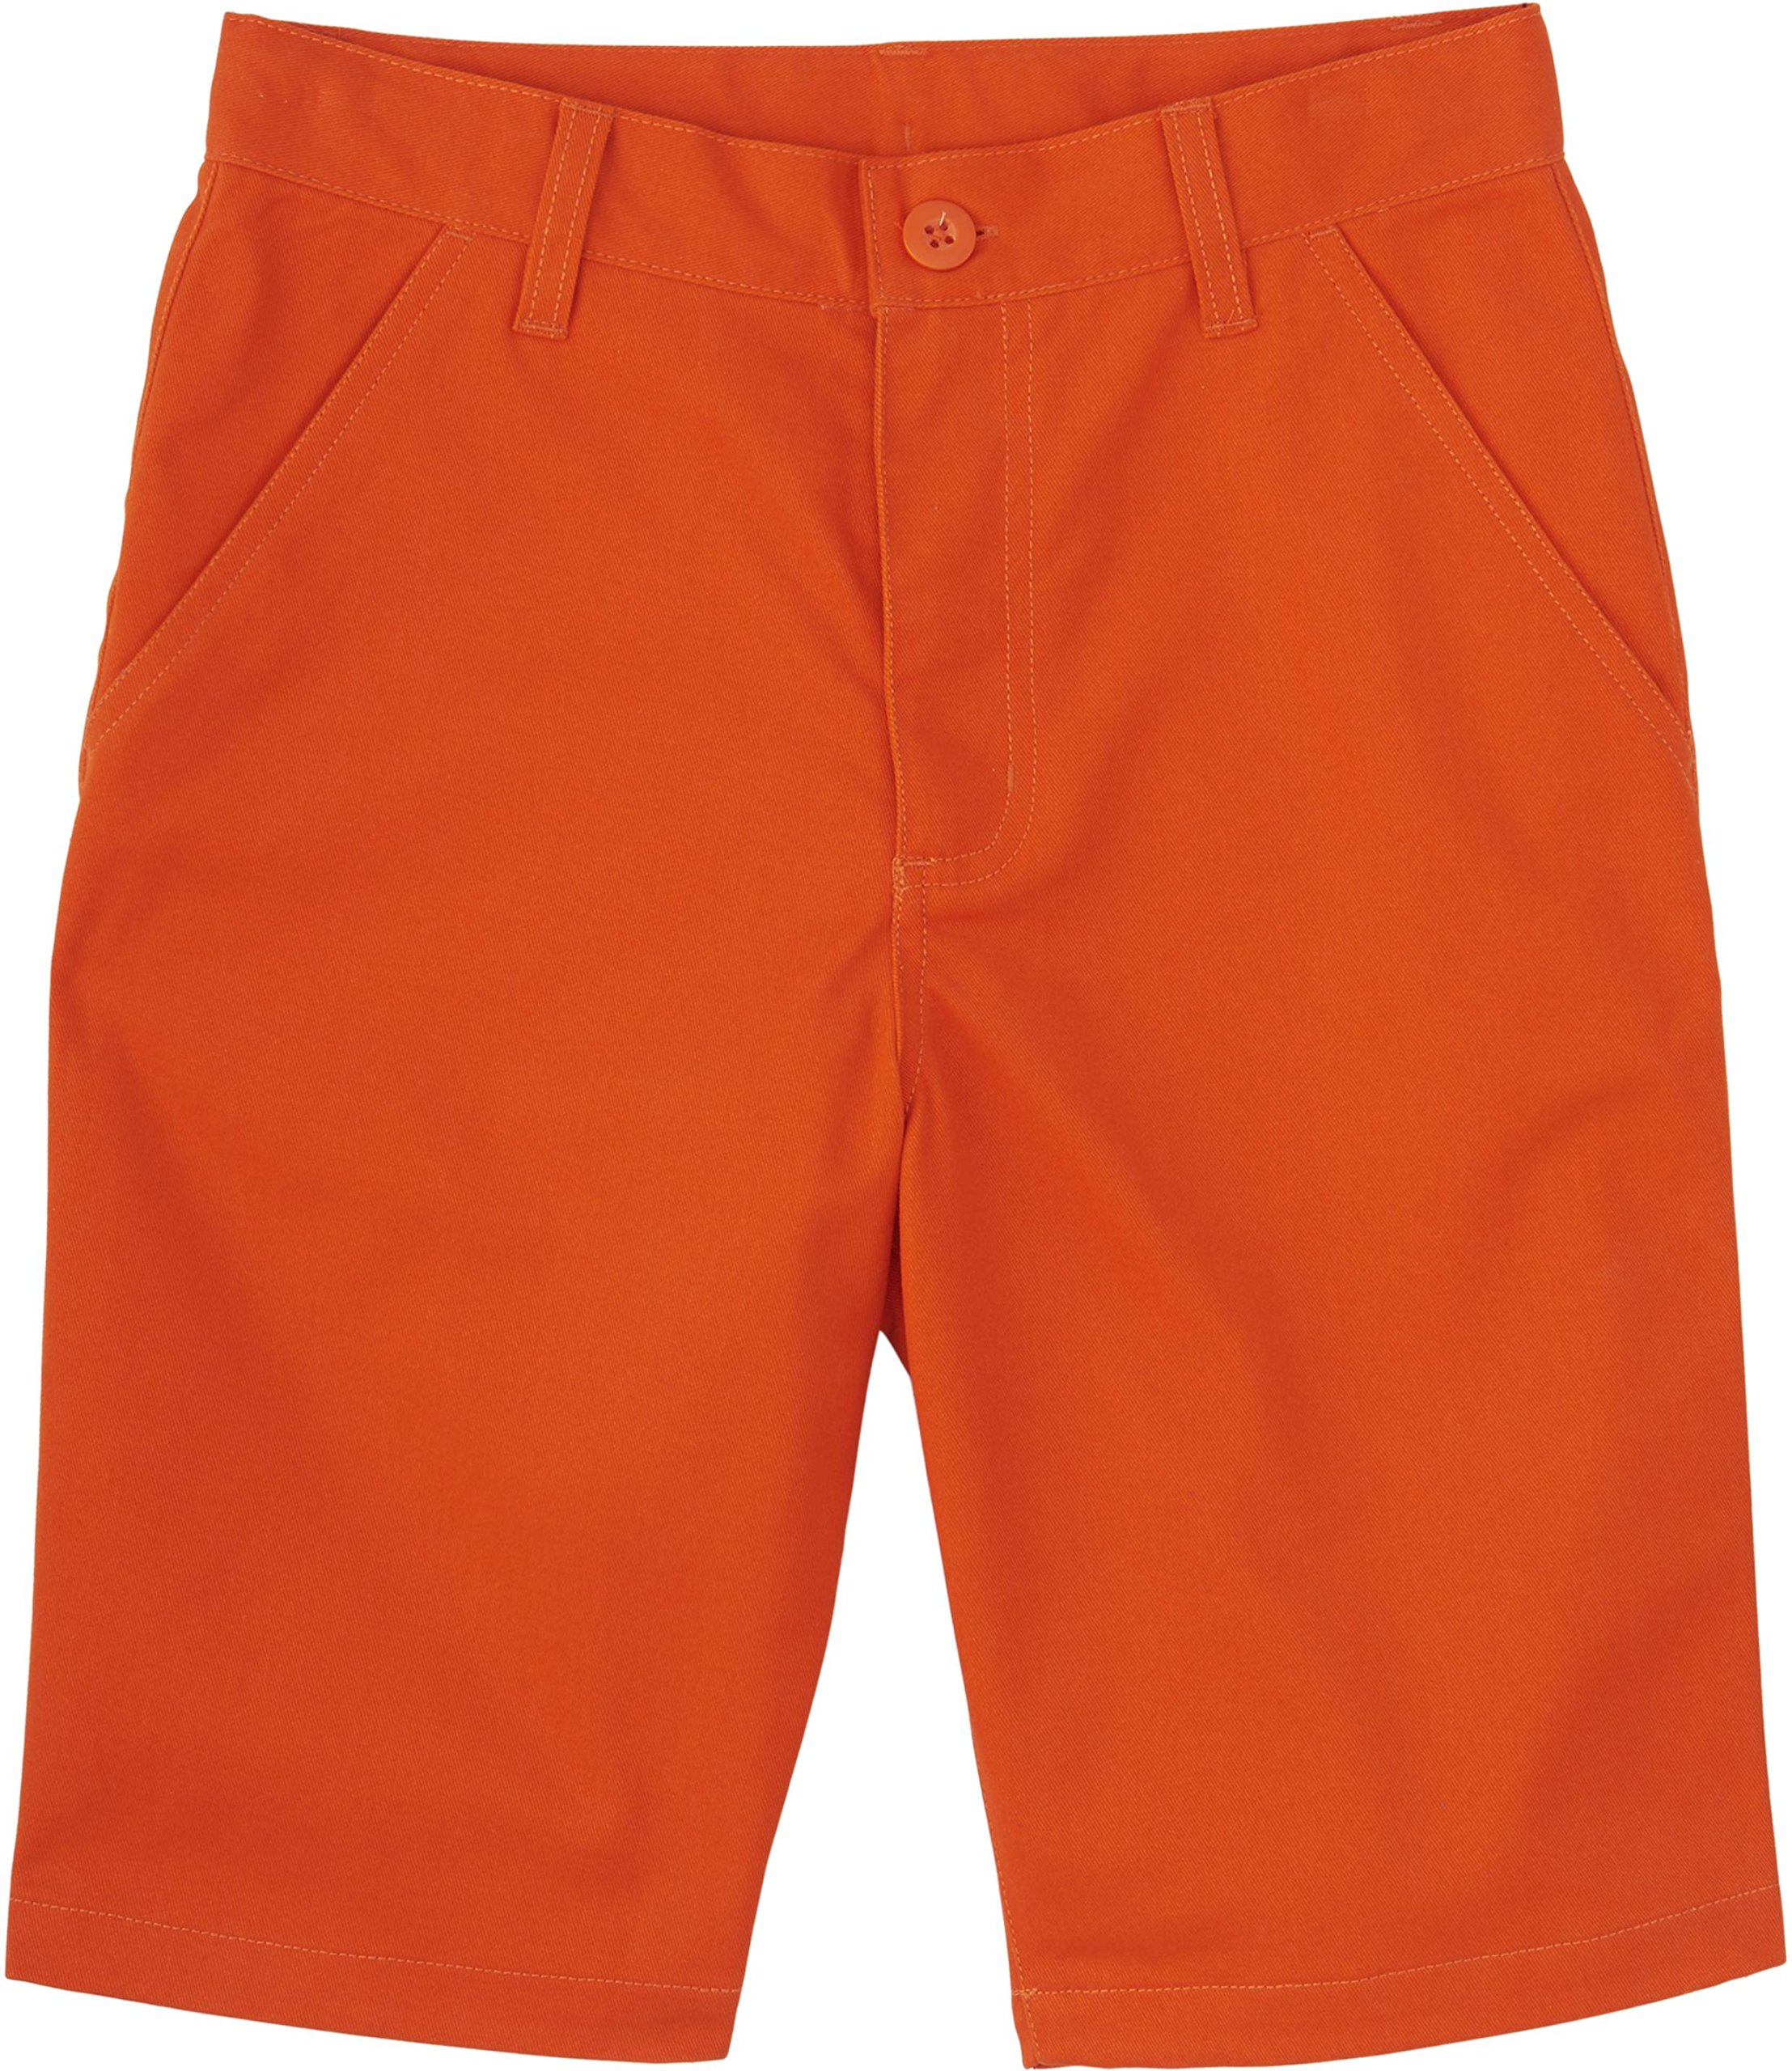 French Toast School Uniforms Boys Solid Twill Flat Front Shorts, Orange Mandarin, 5